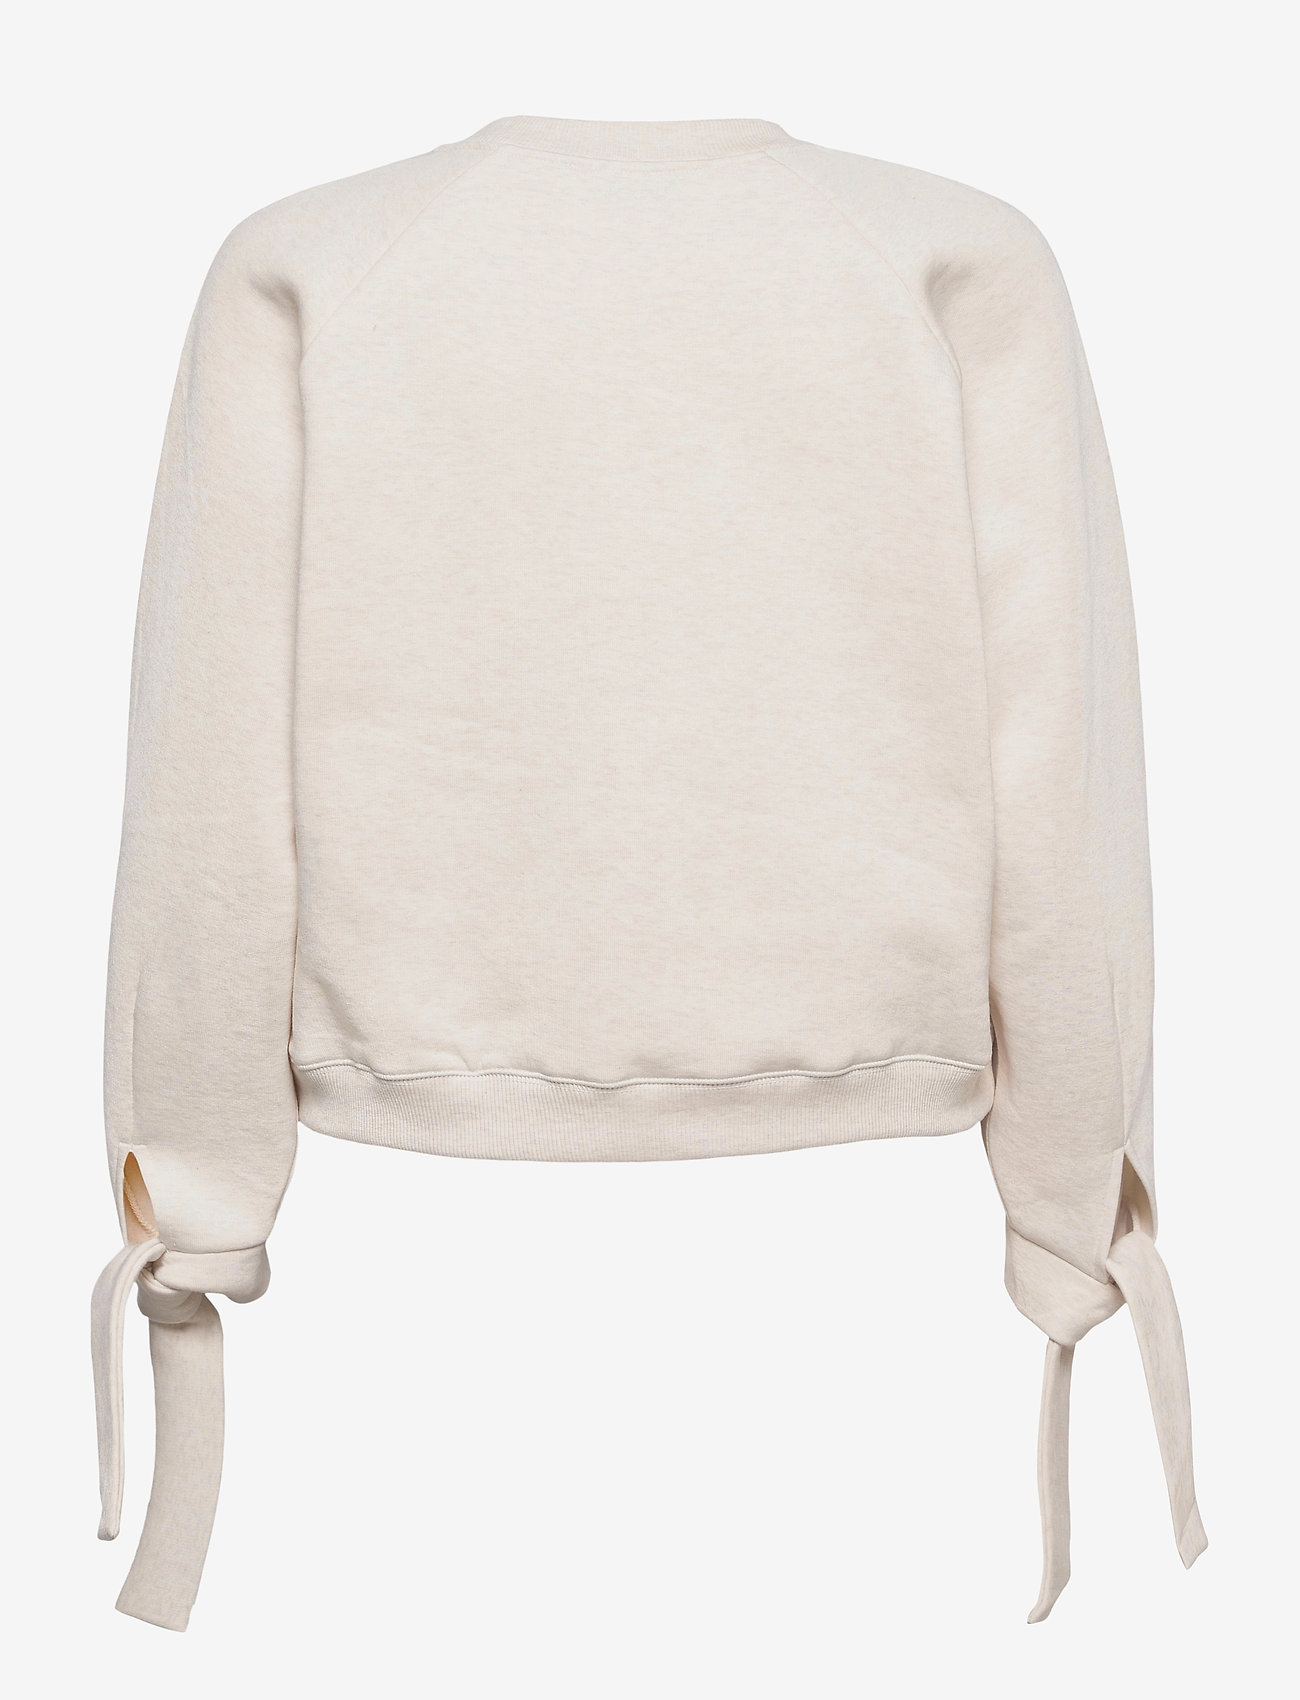 RODEBJER - RODEBJER ZORINA - sweatshirts & hættetrøjer - puffy white - 1